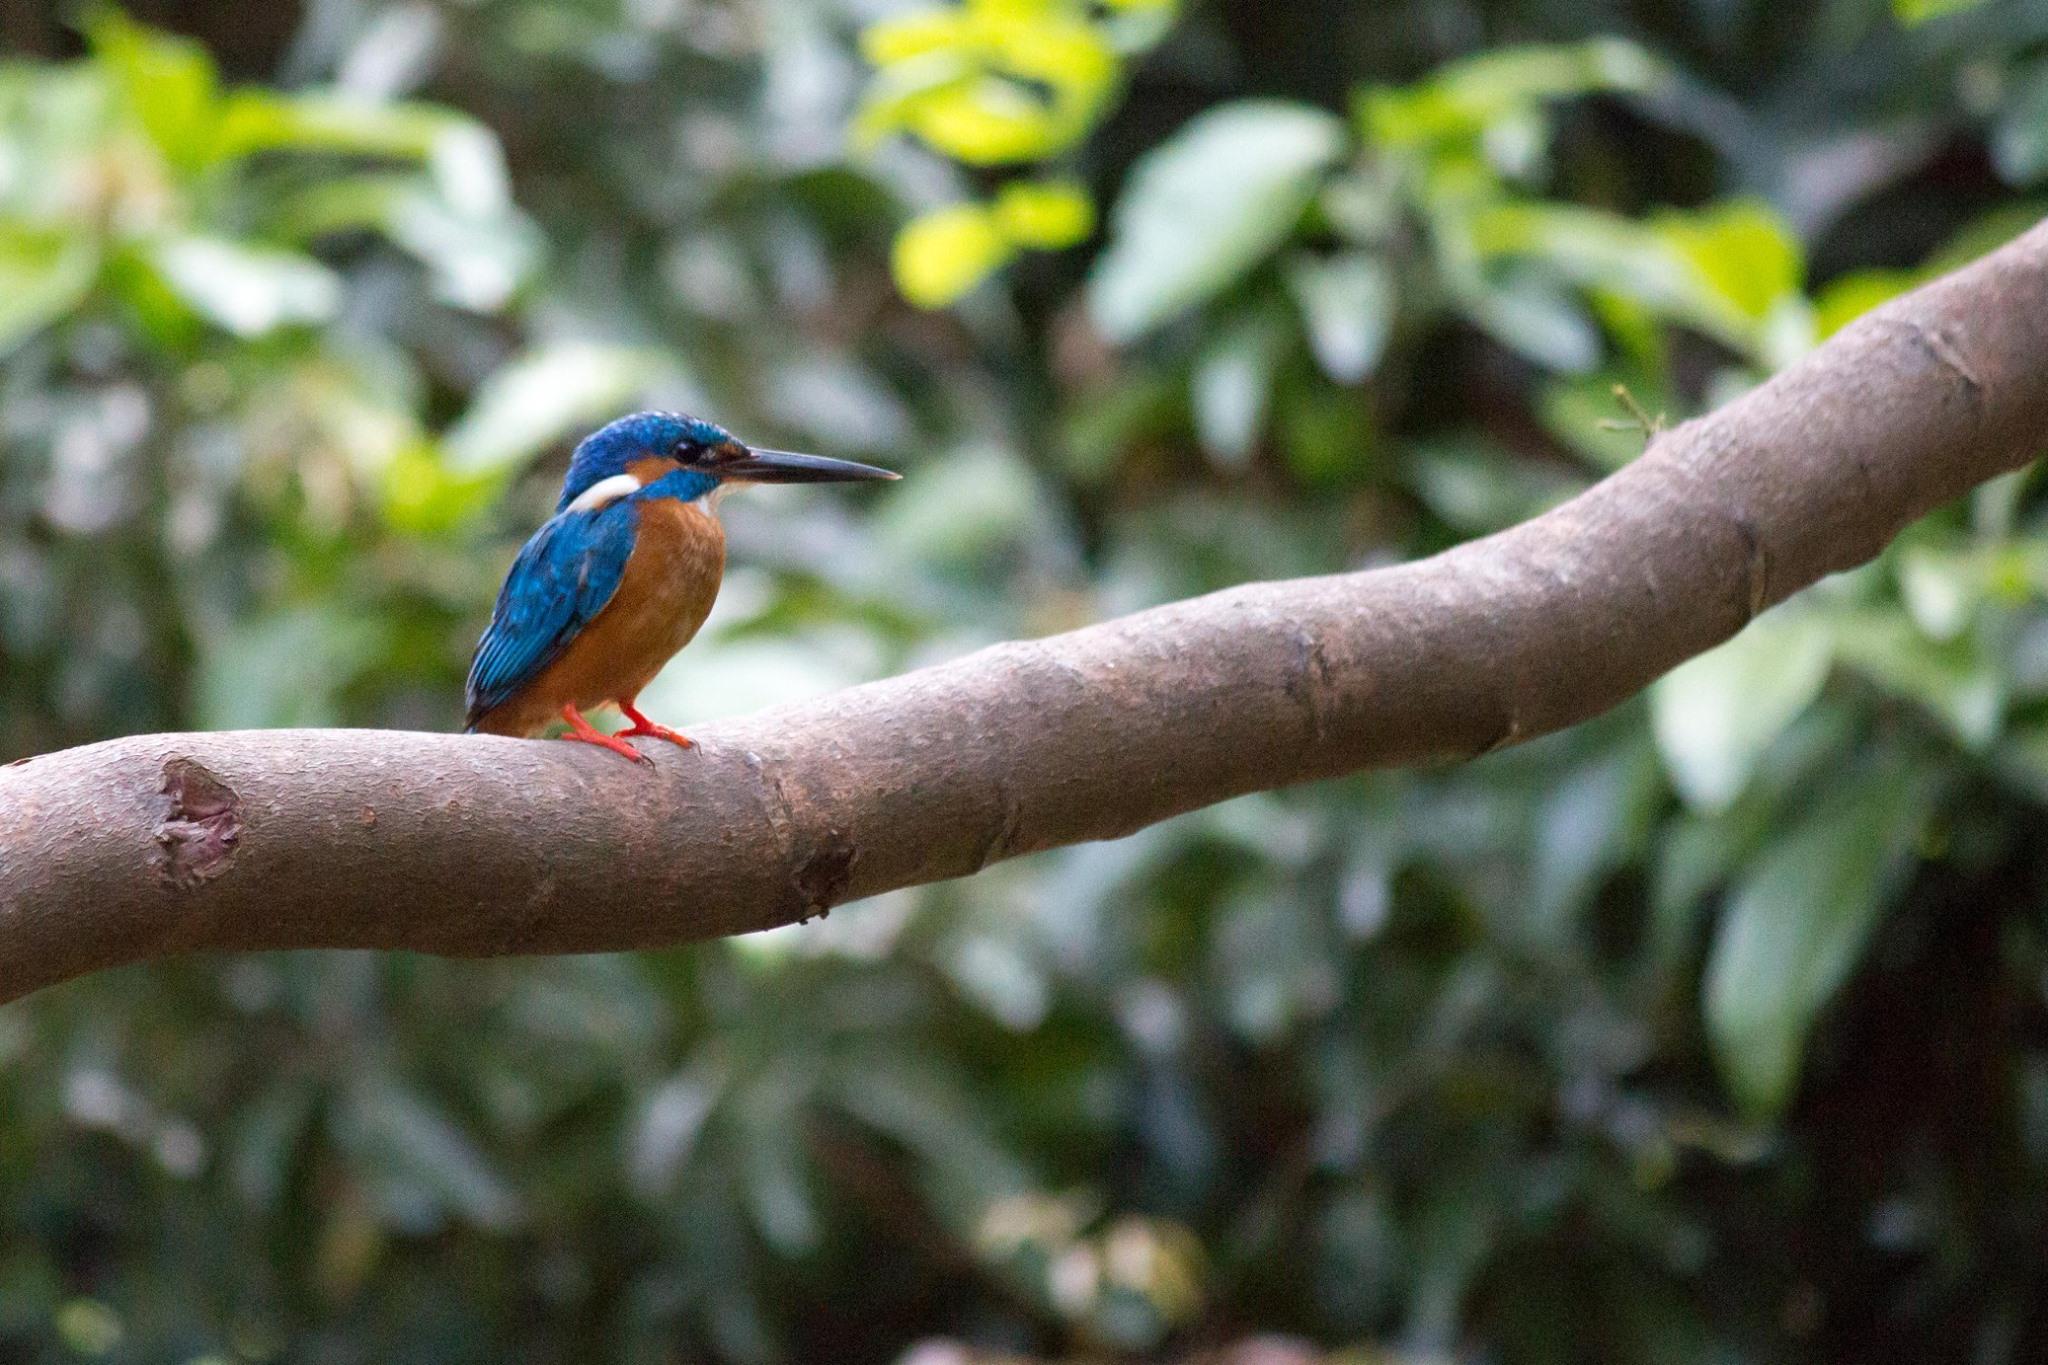 invite-to-paradise-sri-lanka-and-maldives-specialists-travel-agent-tour-operator-customer-review--feedback-joel-rhian-kingfisher-2.jpg